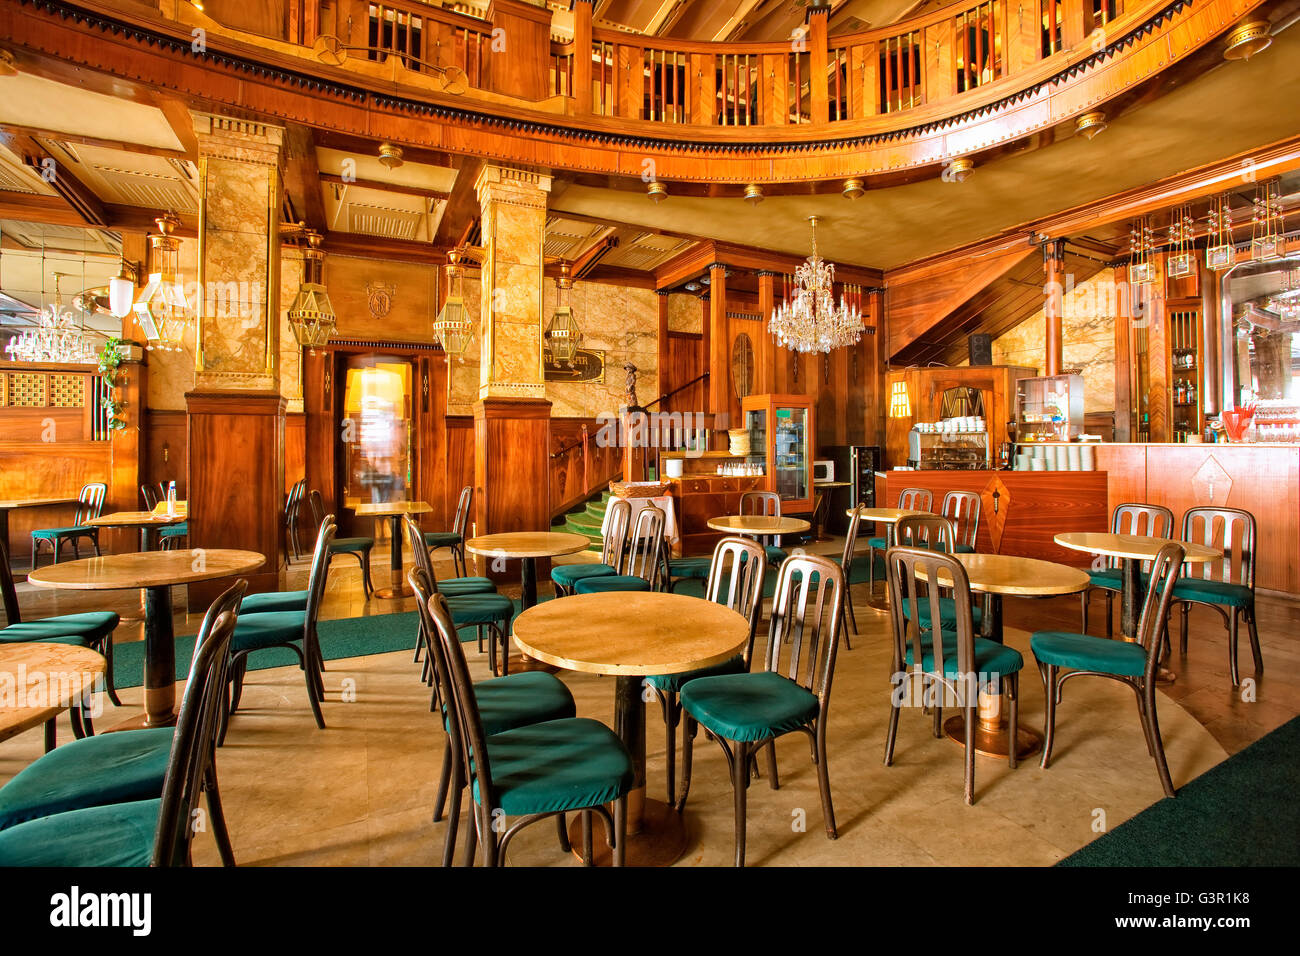 Europa cafe in Wenceslas square in Prague - Stock Image